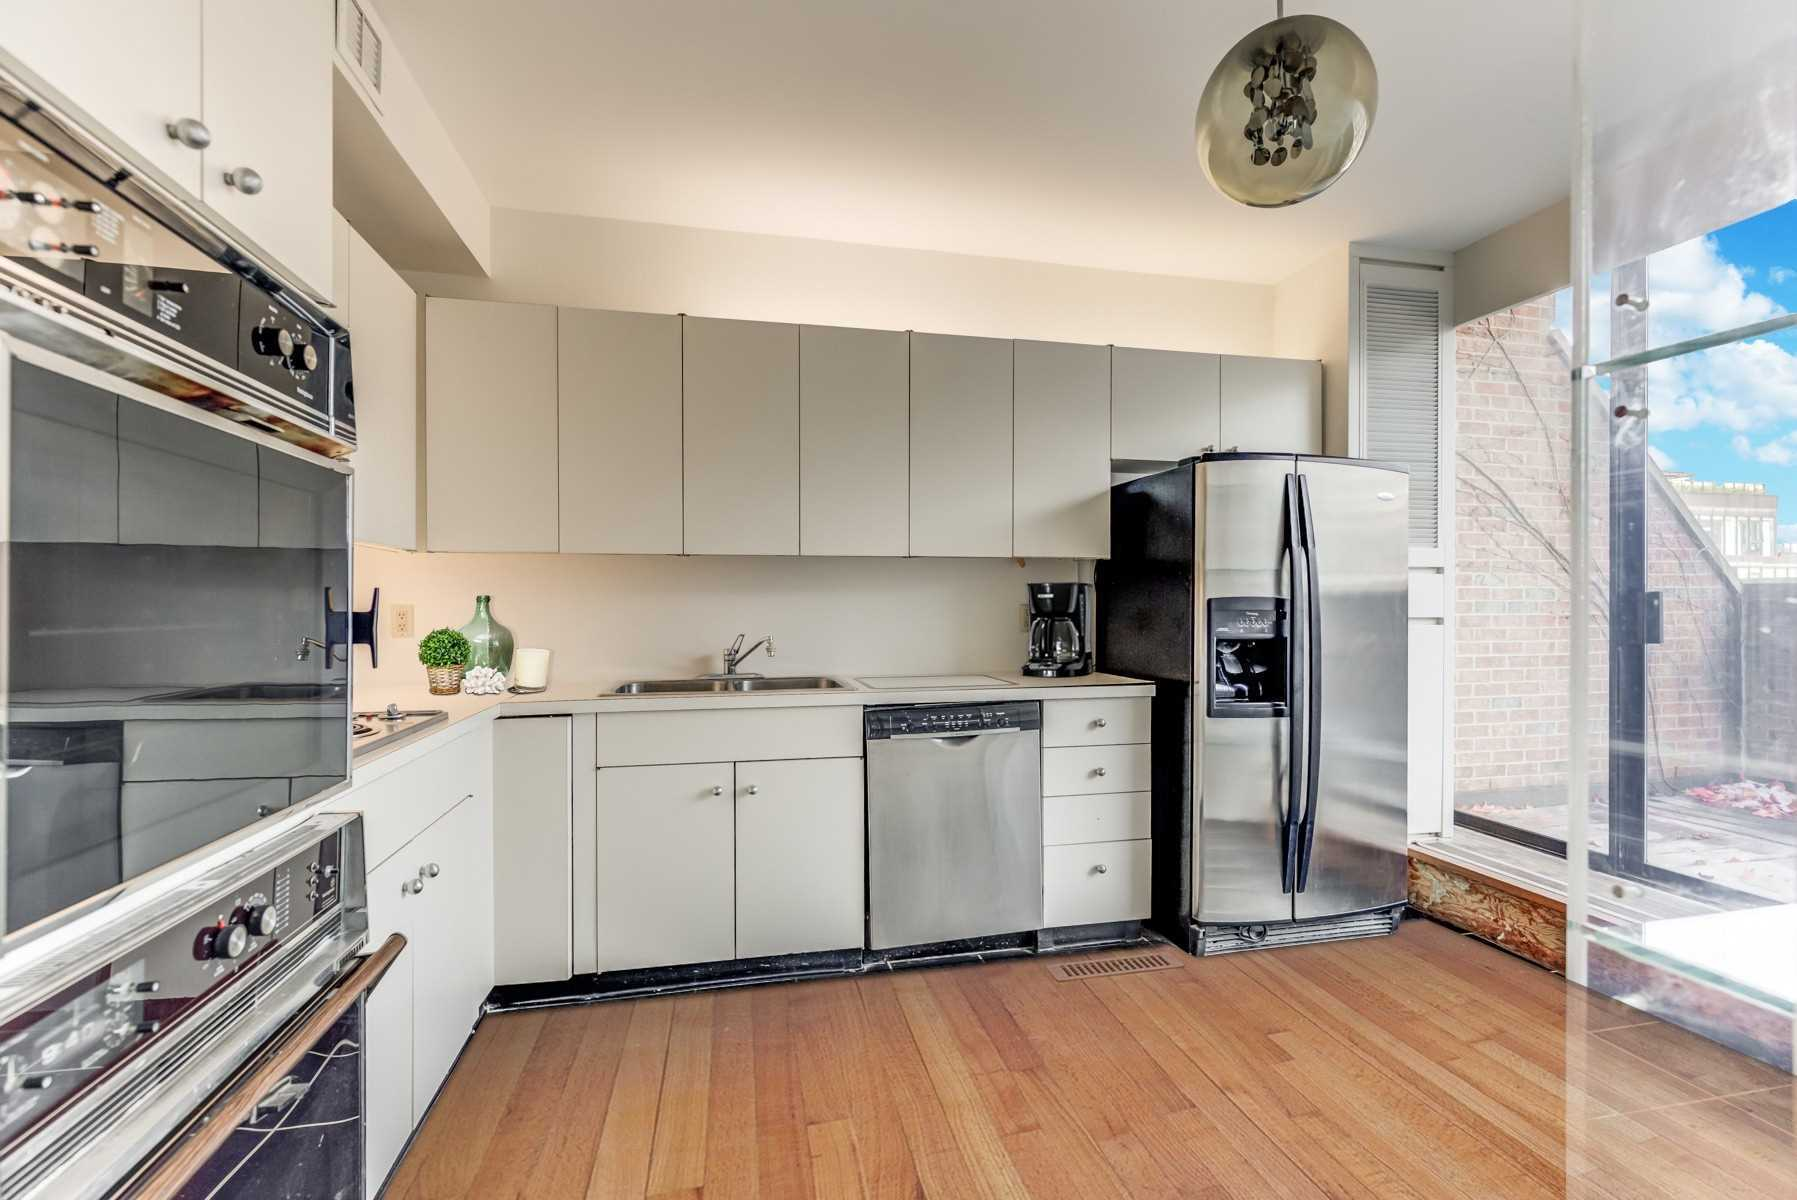 607 - 55A Avenue Rd - Annex Condo Apt for sale, 2 Bedrooms (C5185690) - #5